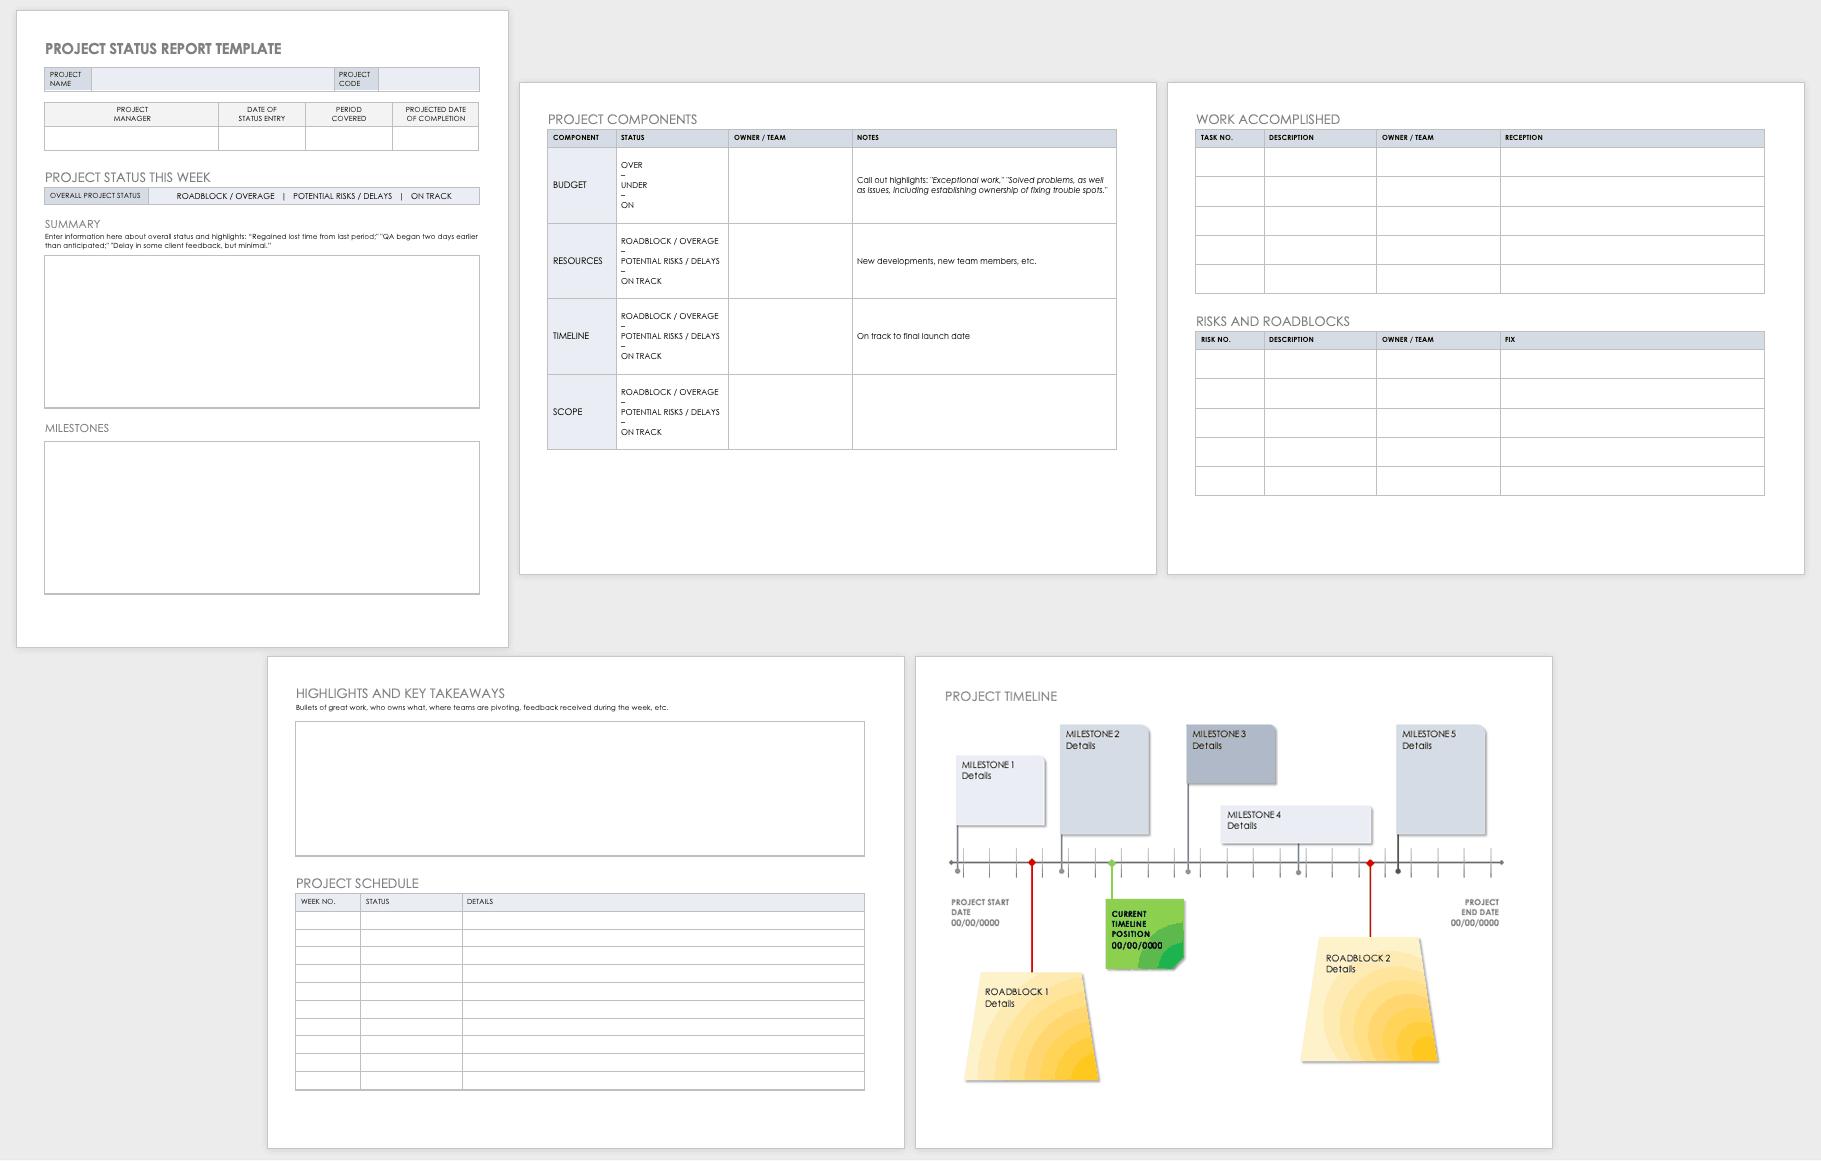 Free Project Plan Templates For Word   Smartsheet Regarding Work Plan Template Word